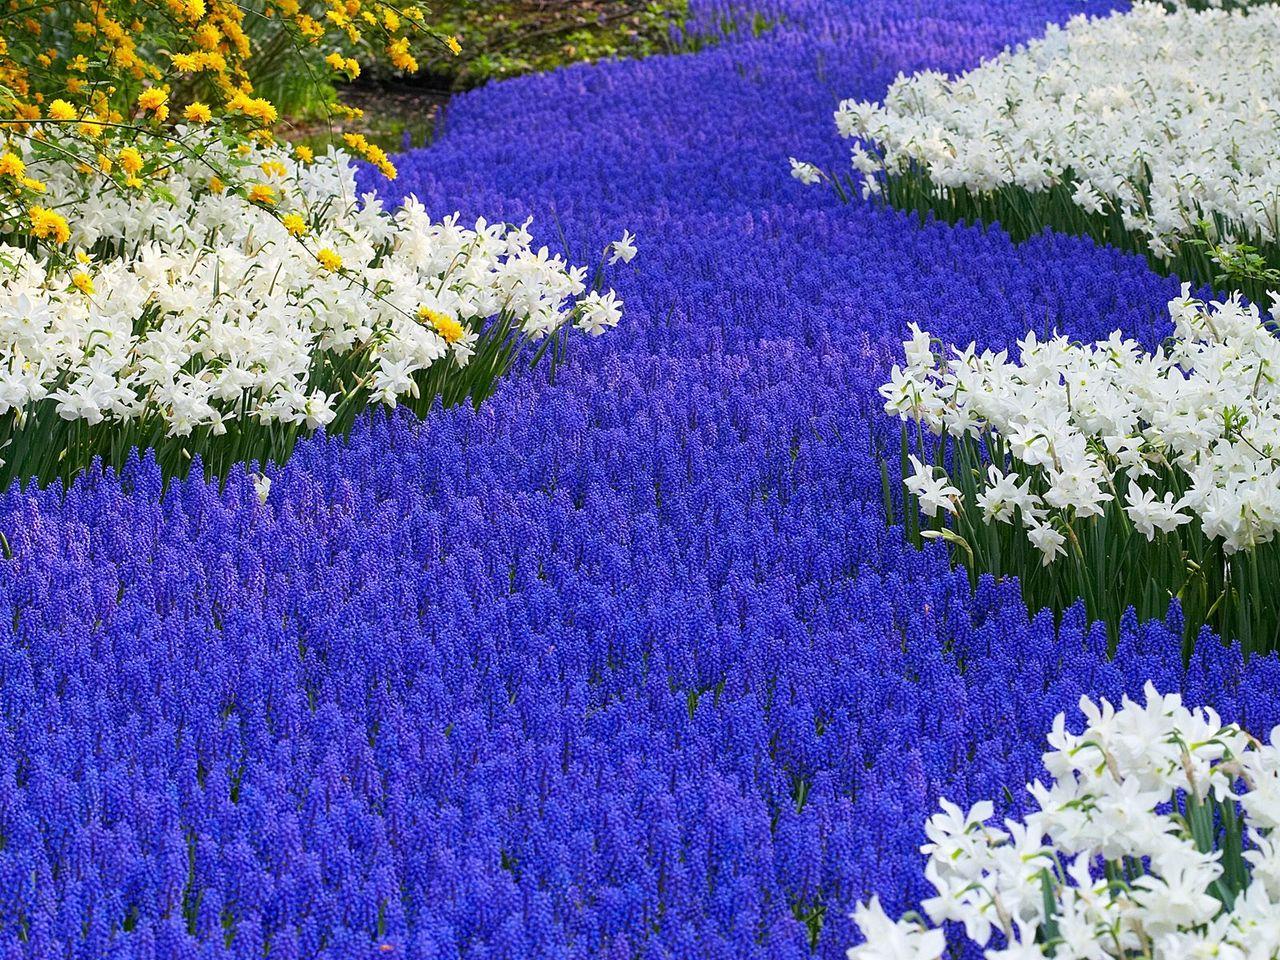 grape-hyacinths-and-daffodils--keukenhof-gardens--lisse--holland